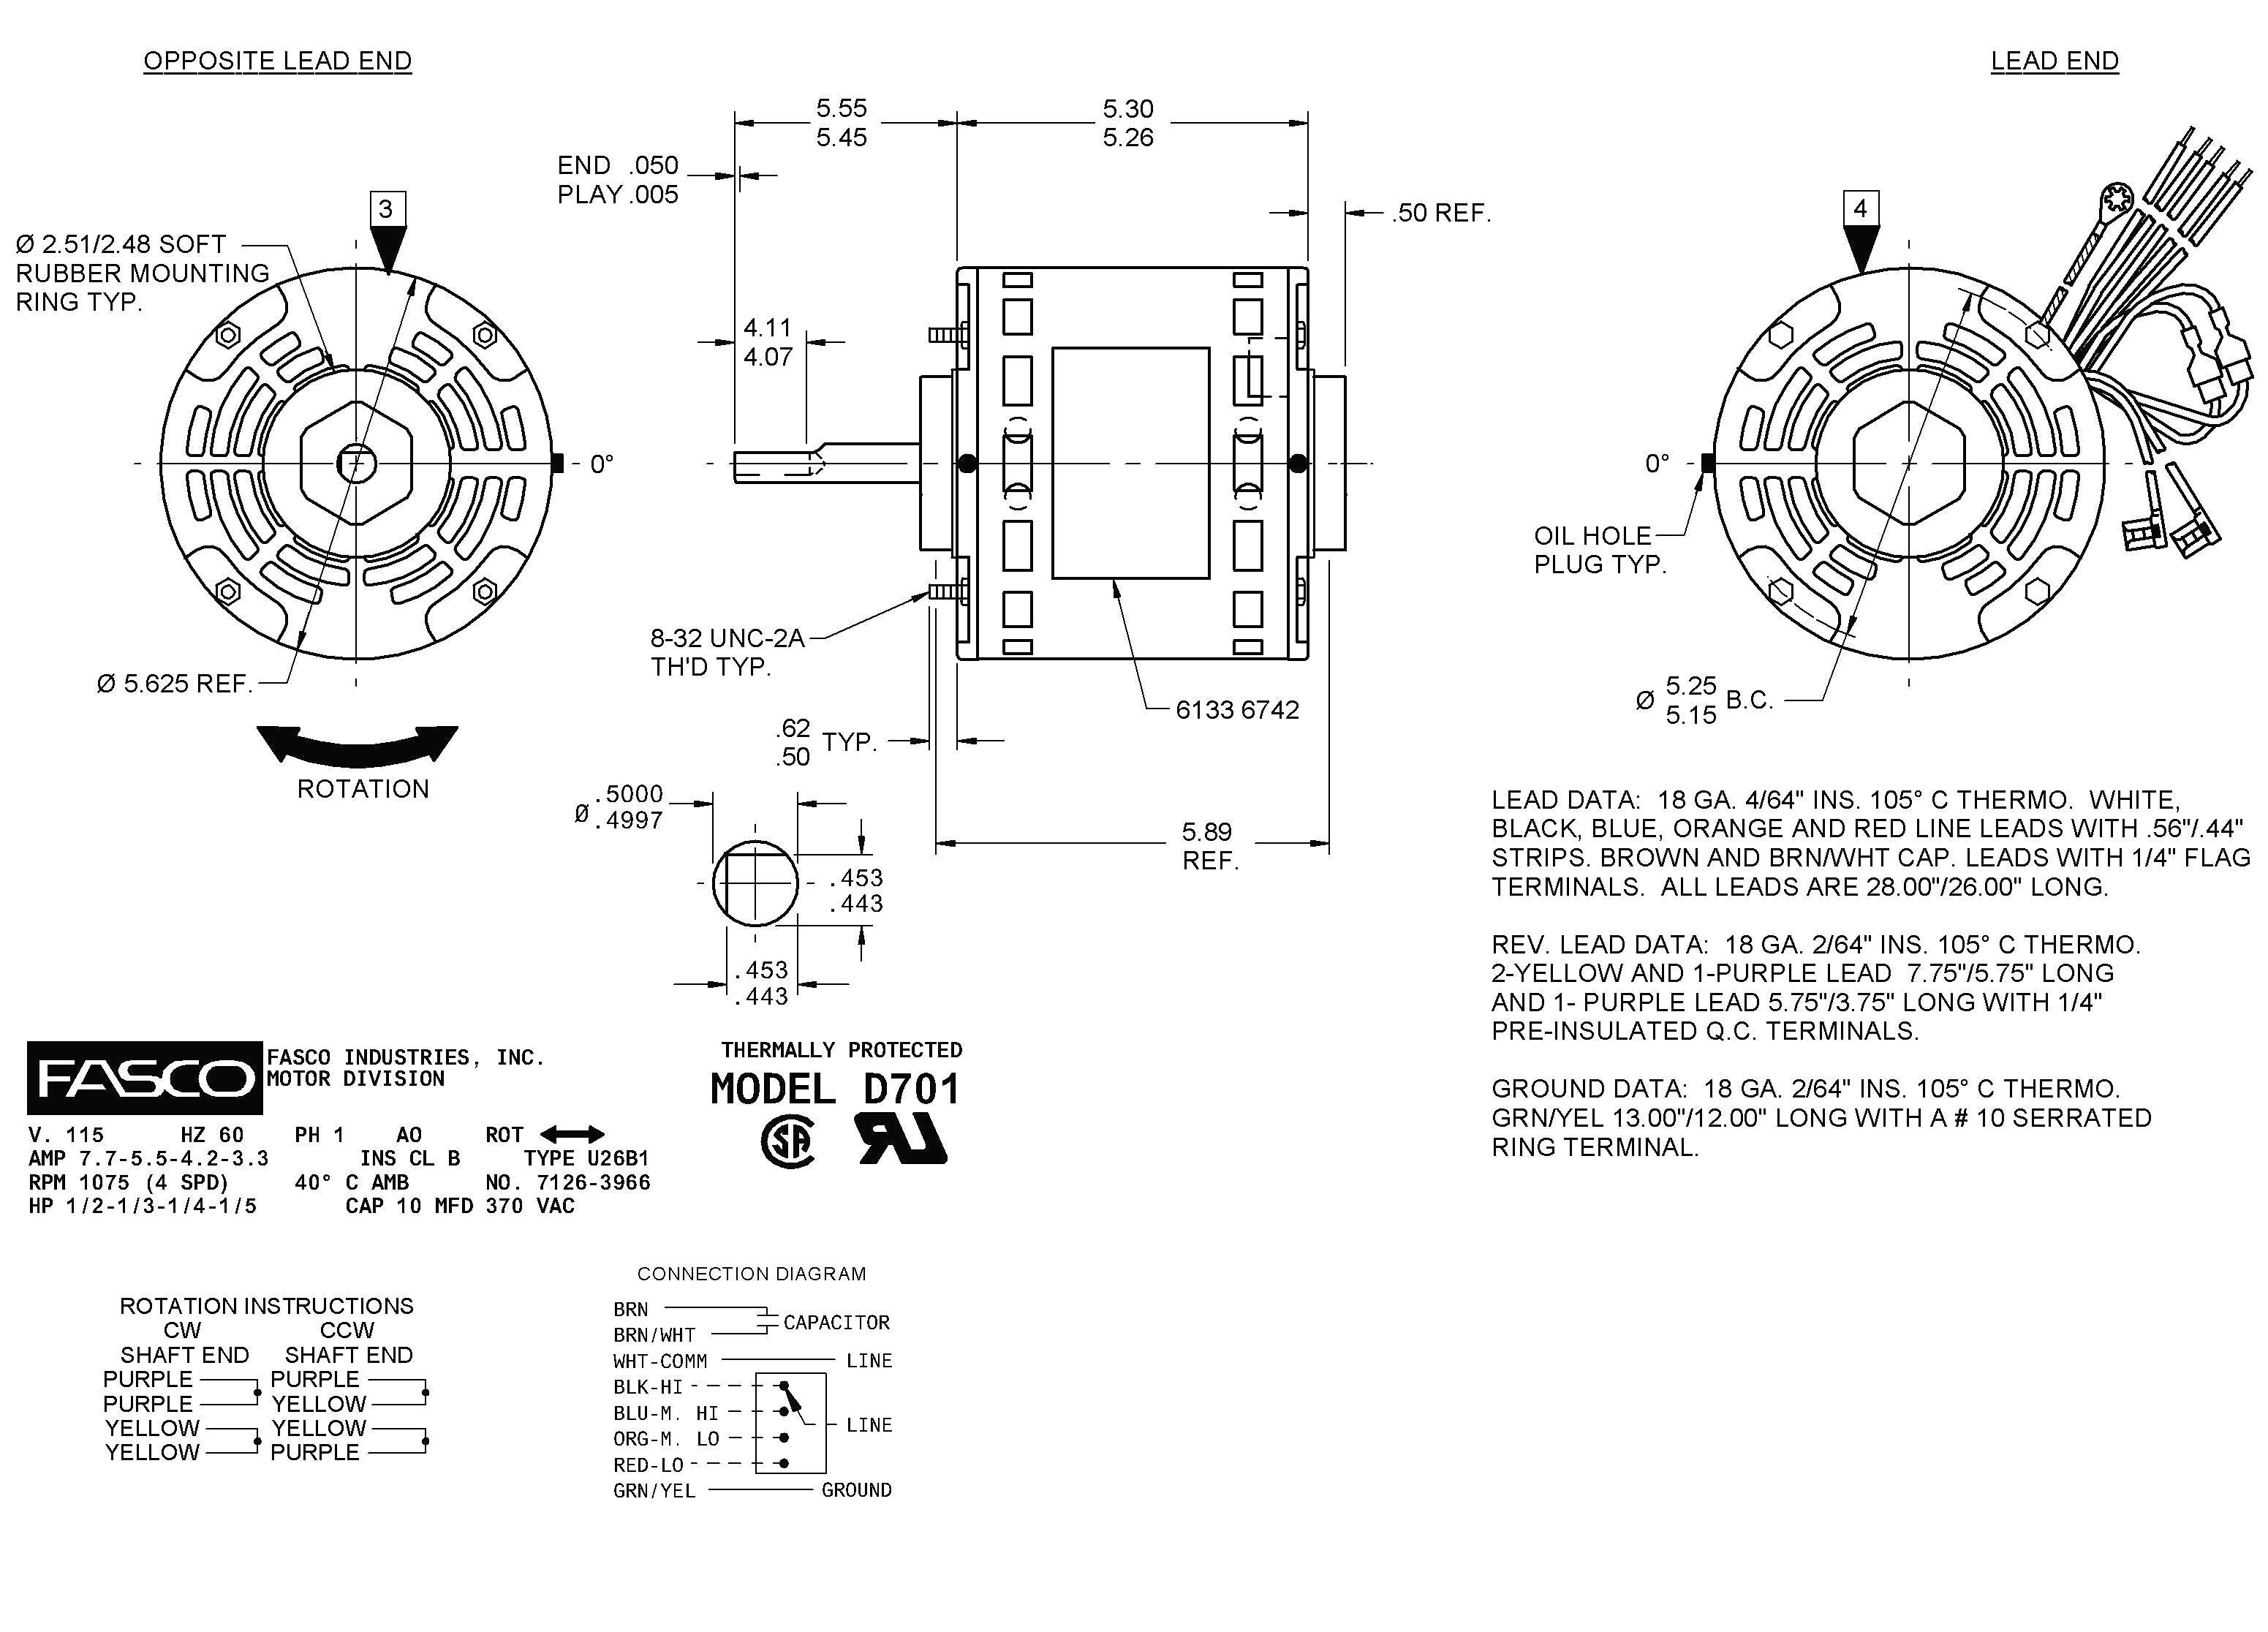 [DIAGRAM_38IU]  KR_3790] Four Speed Motor Wiring Diagram Download Diagram | Four Speed Motor Wiring Diagram |  | Antus Renstra Fr09 Librar Wiring 101